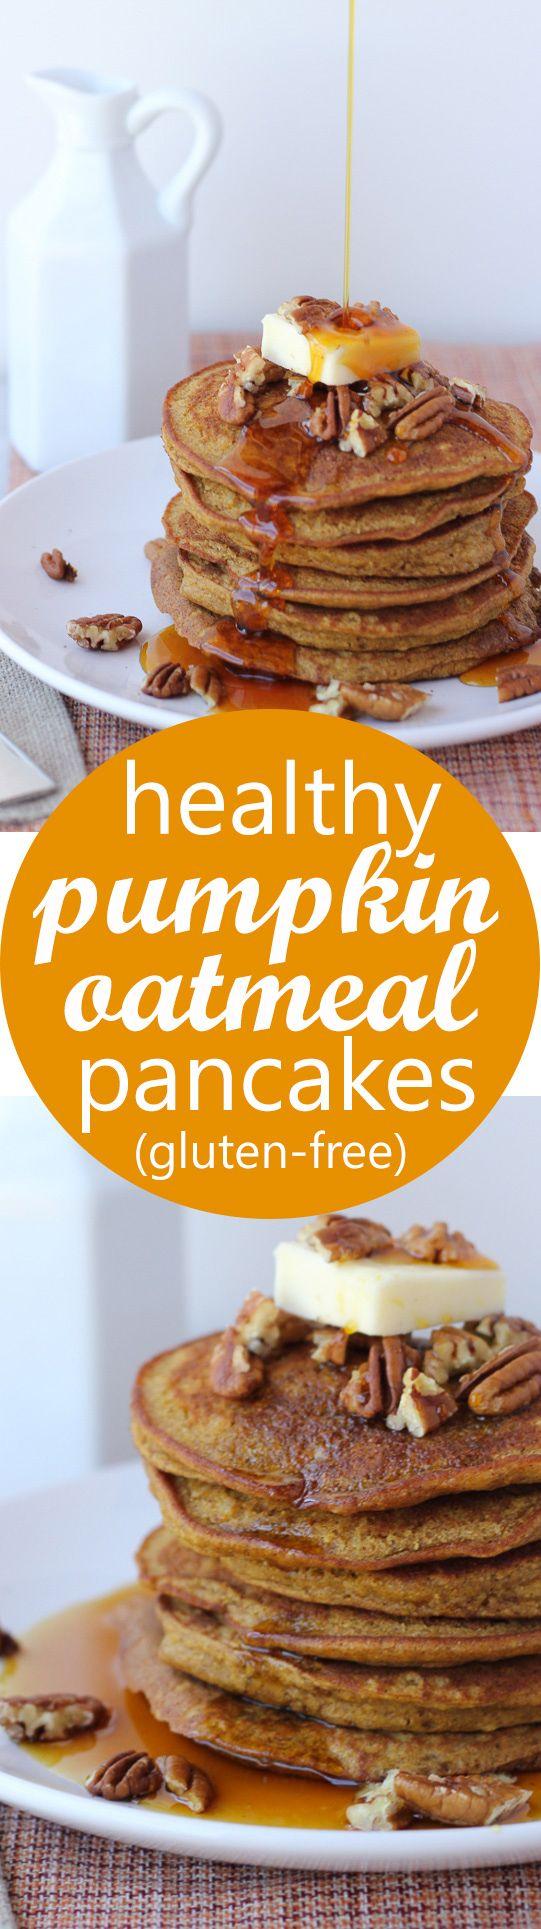 Oatmeal Pancakes (Gluten-Free, Dairy-Free) | Recipe | Oatmeal Pancakes ...